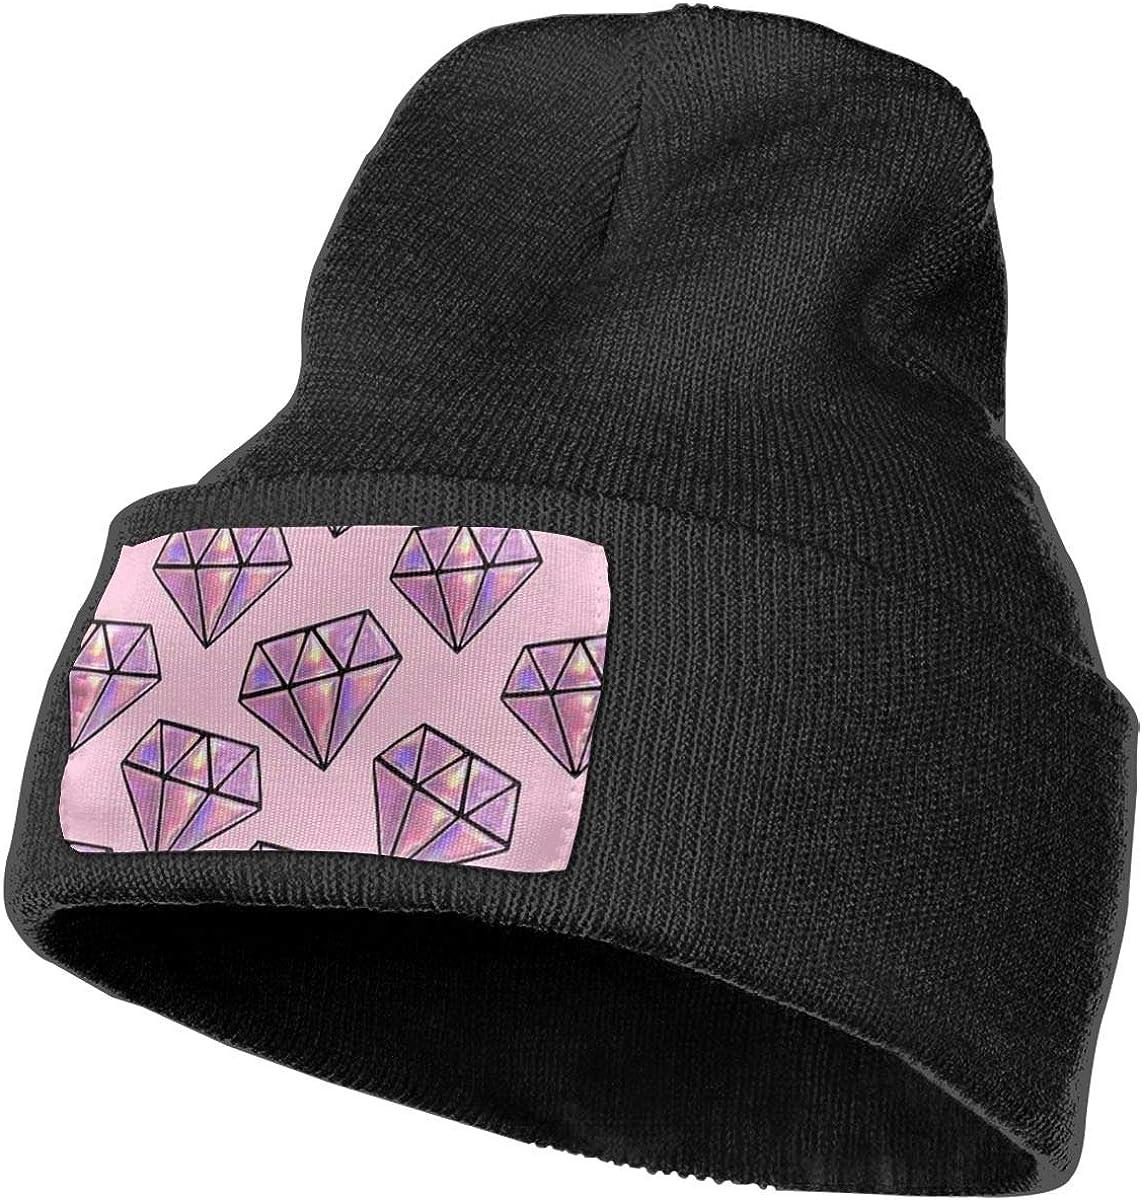 Diamond Men Women Plain Cuff Serious Style Beanie Hat Skull Personalized Beanie